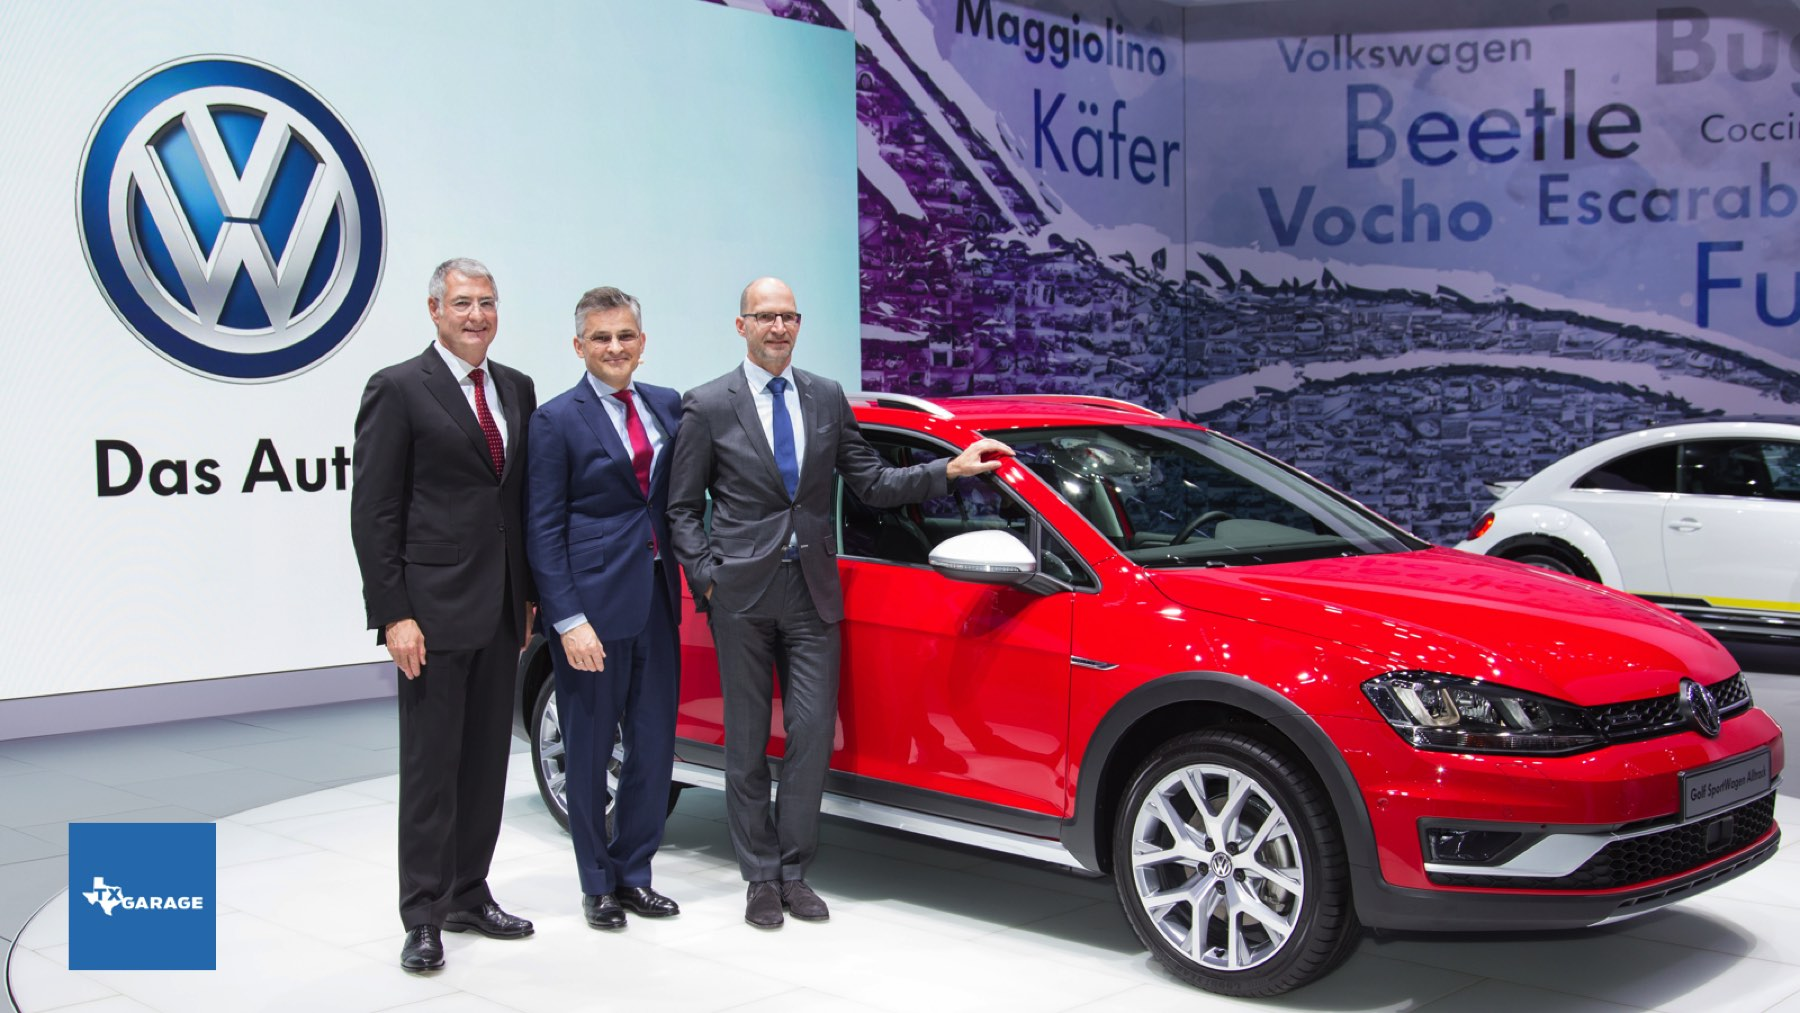 VW-02-txGarage